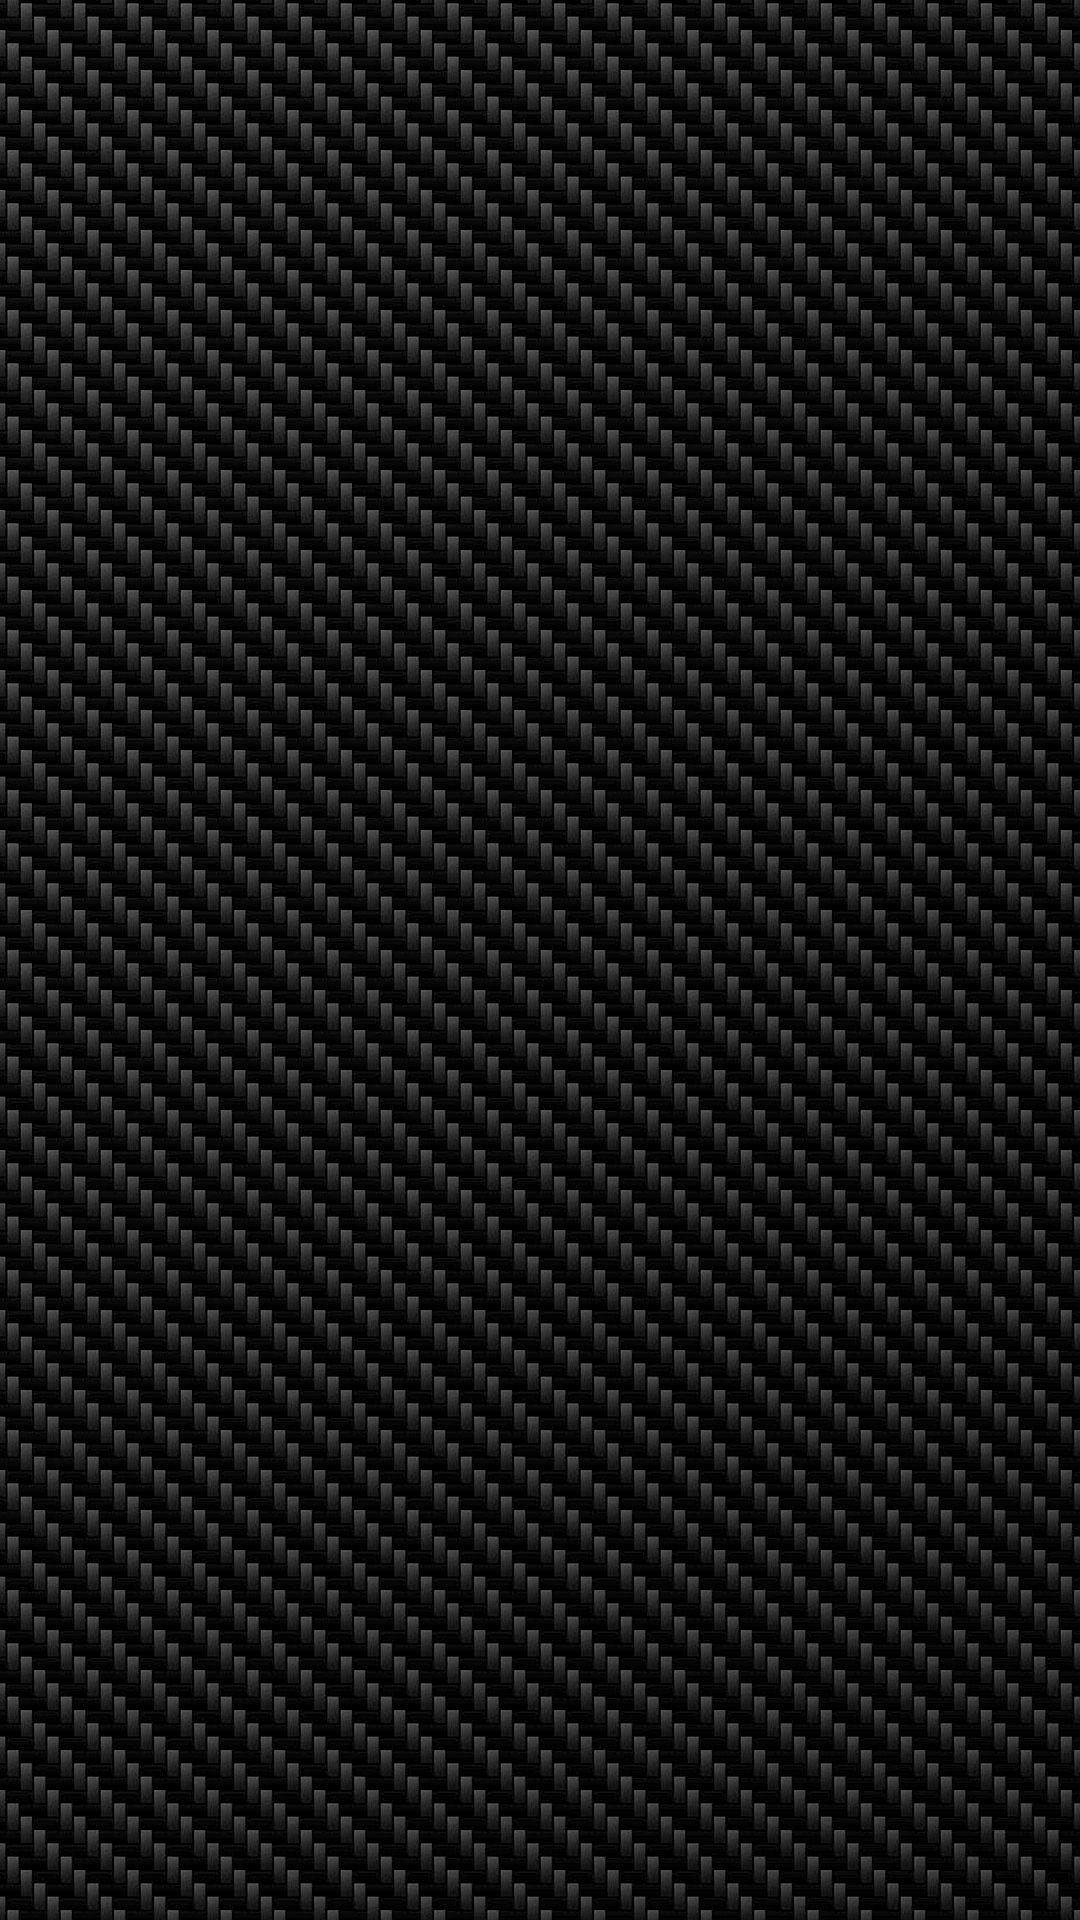 iphonecarbonfiberwallpaper2.jpg (1080×1920